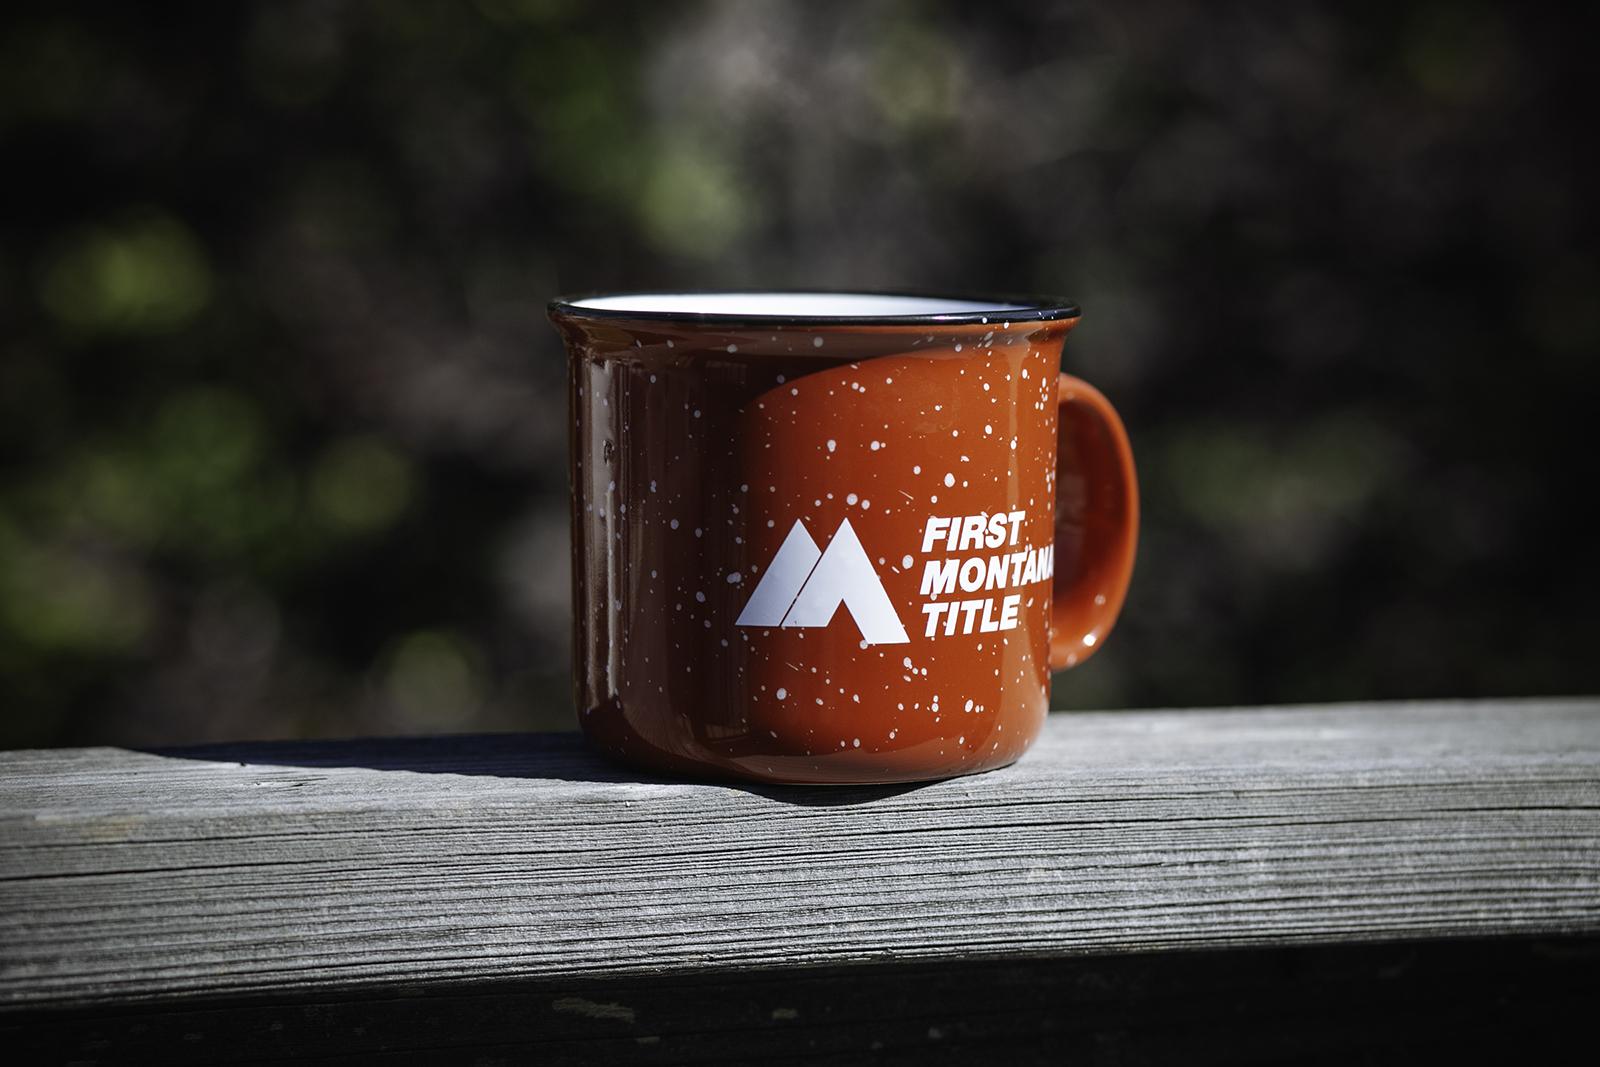 First Montana Title Camping Mug